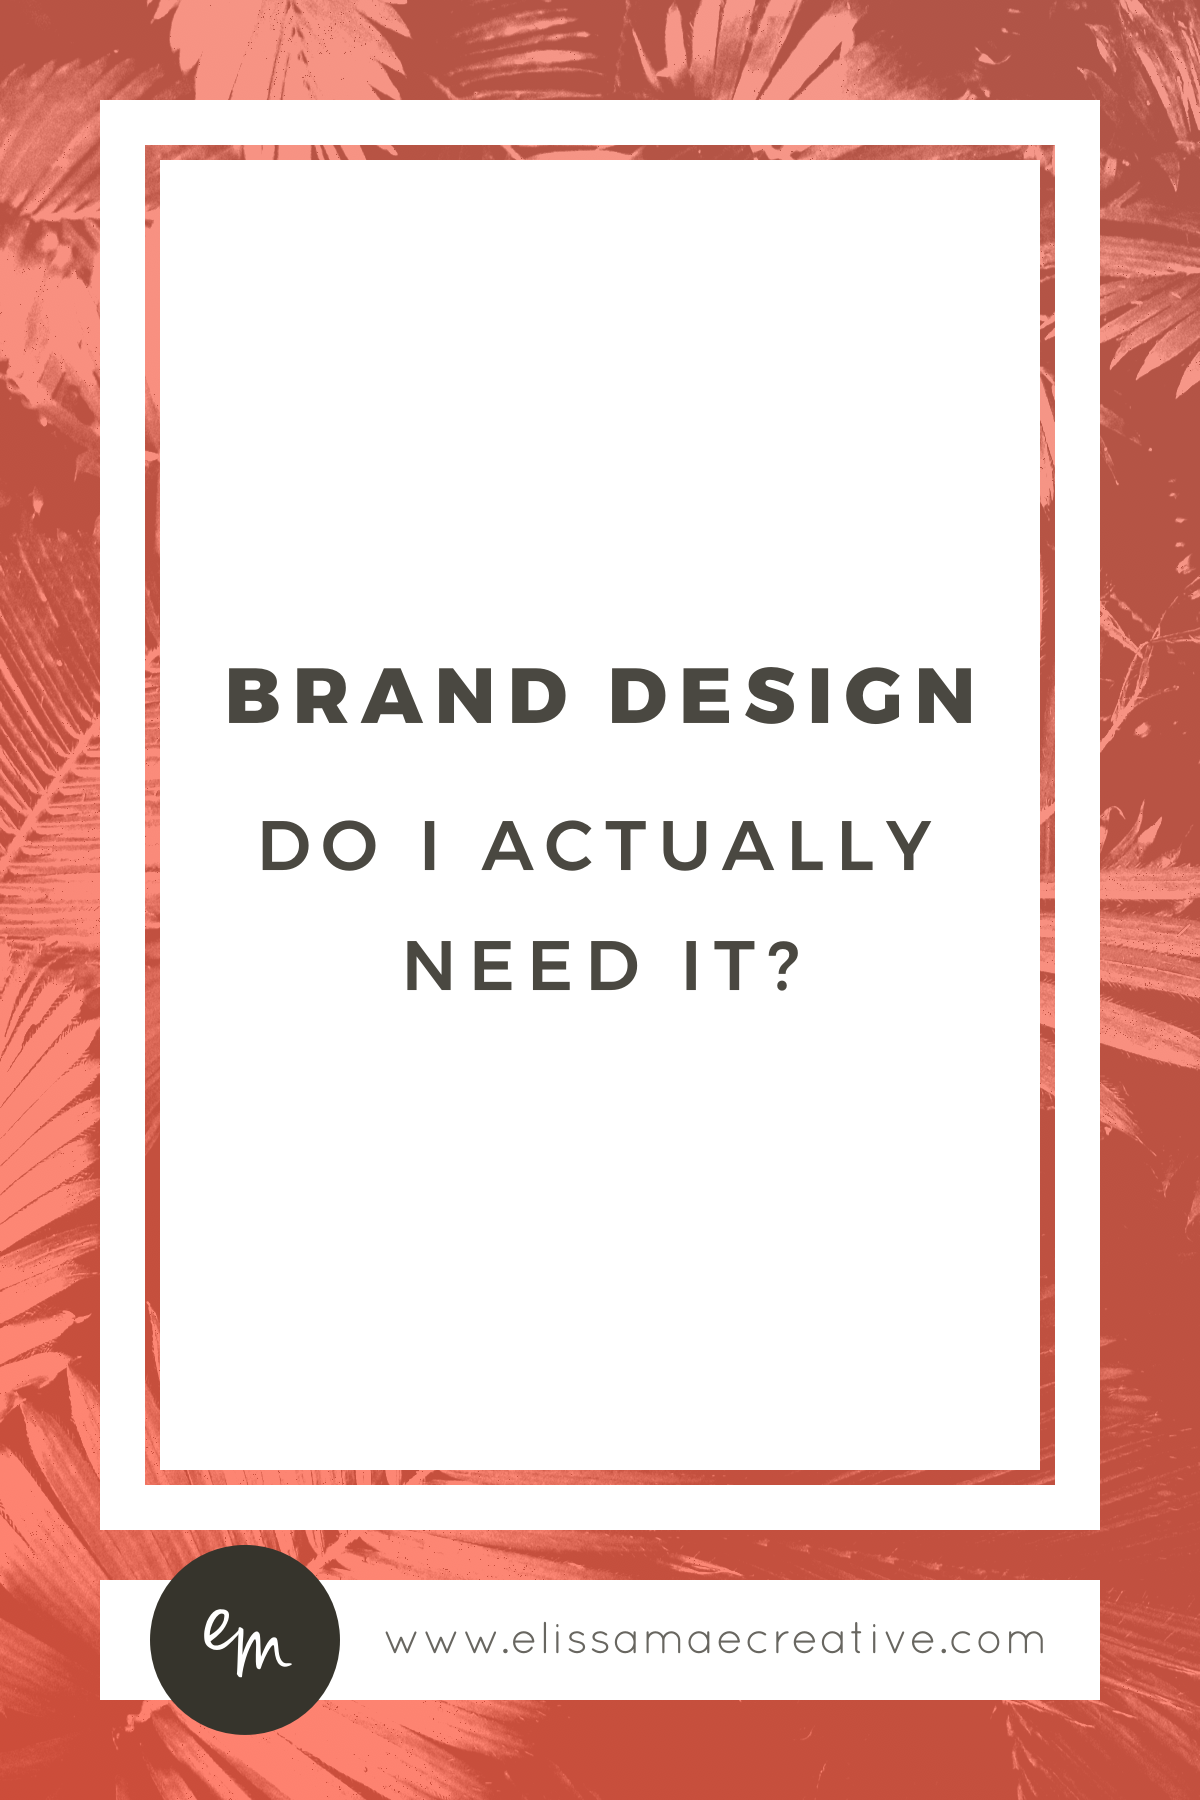 Brand Design: Do I Actually Need It?